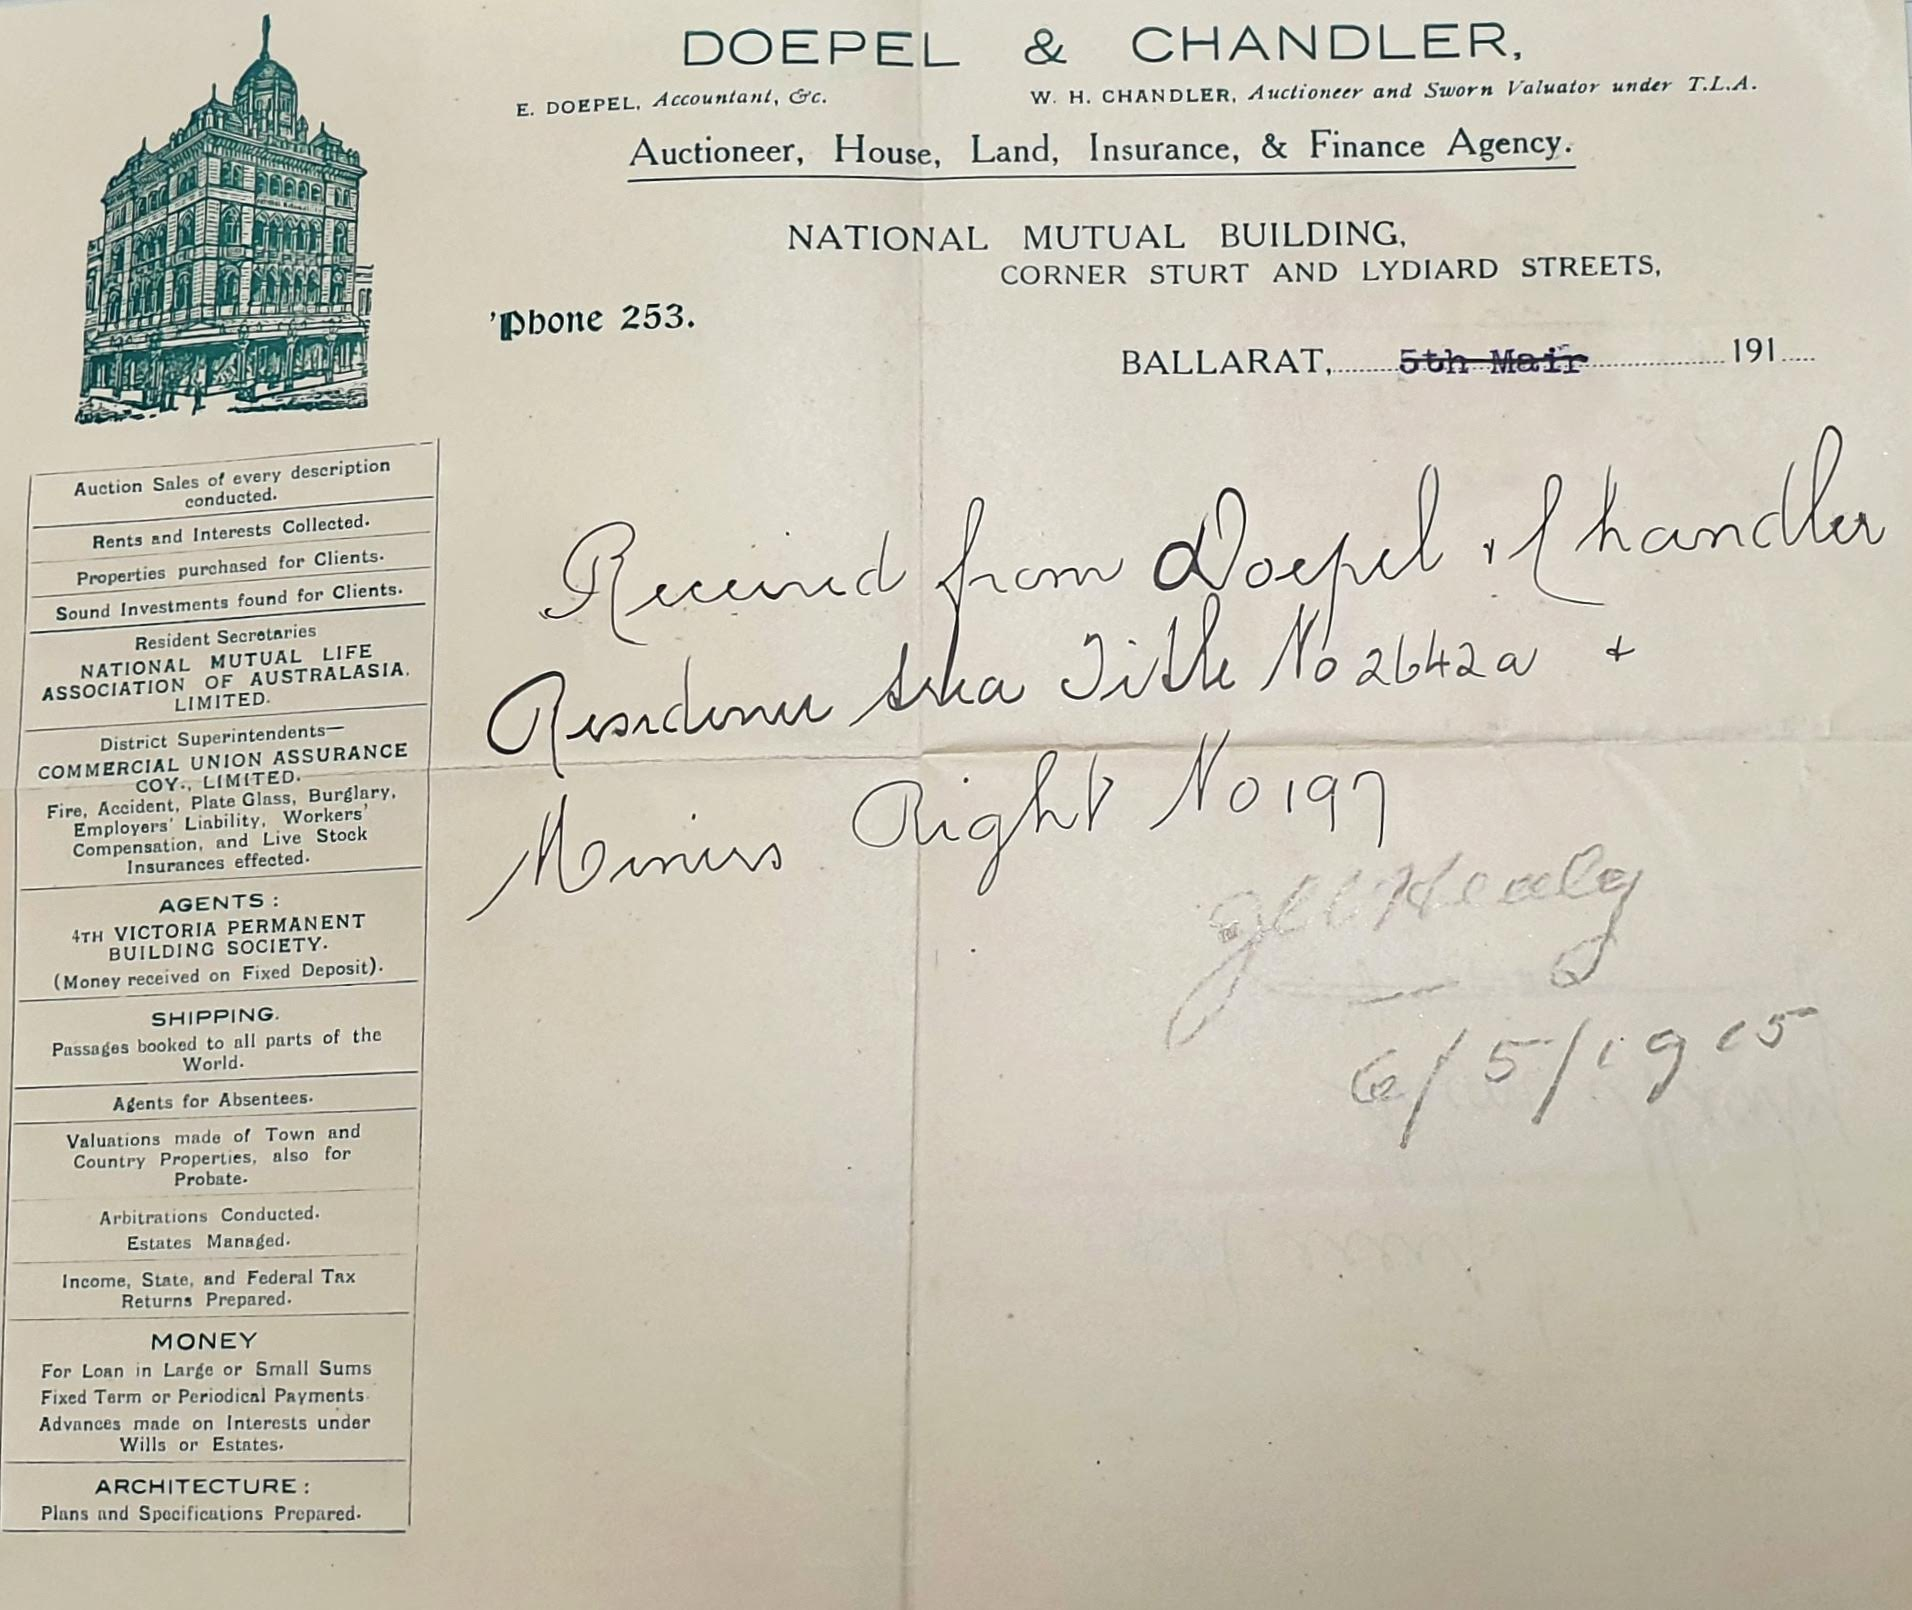 Doepel & Chandler Receipt May 1915